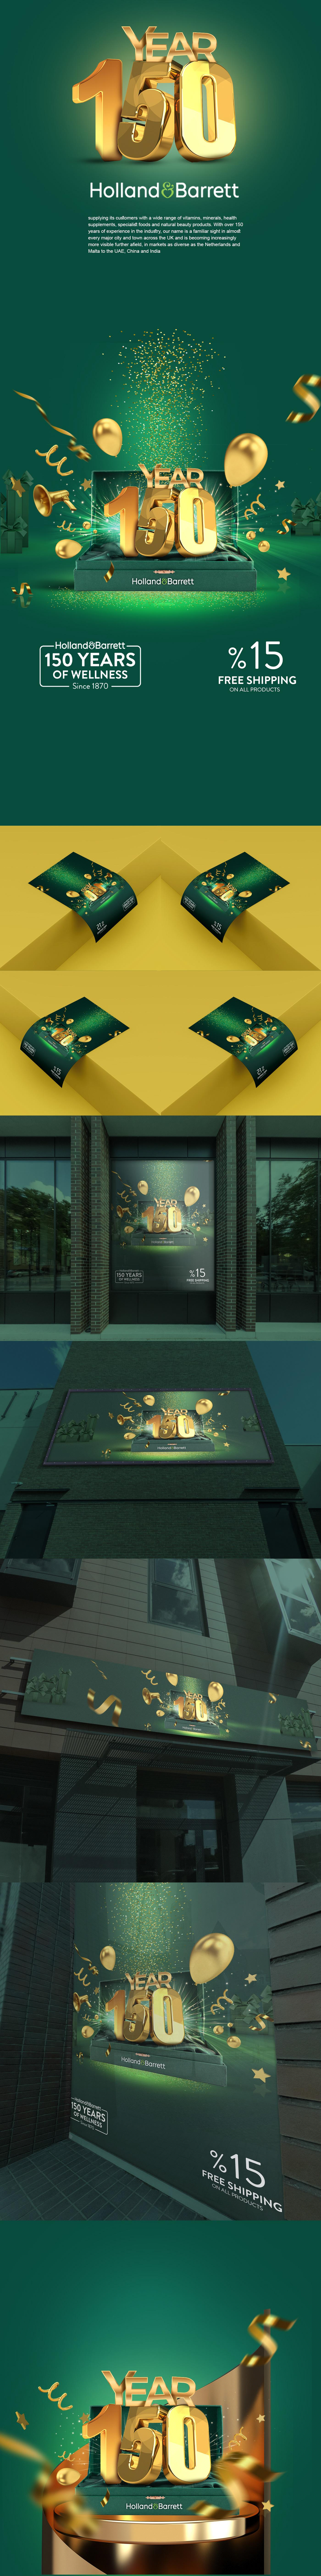 design ads Socialmedia 3D